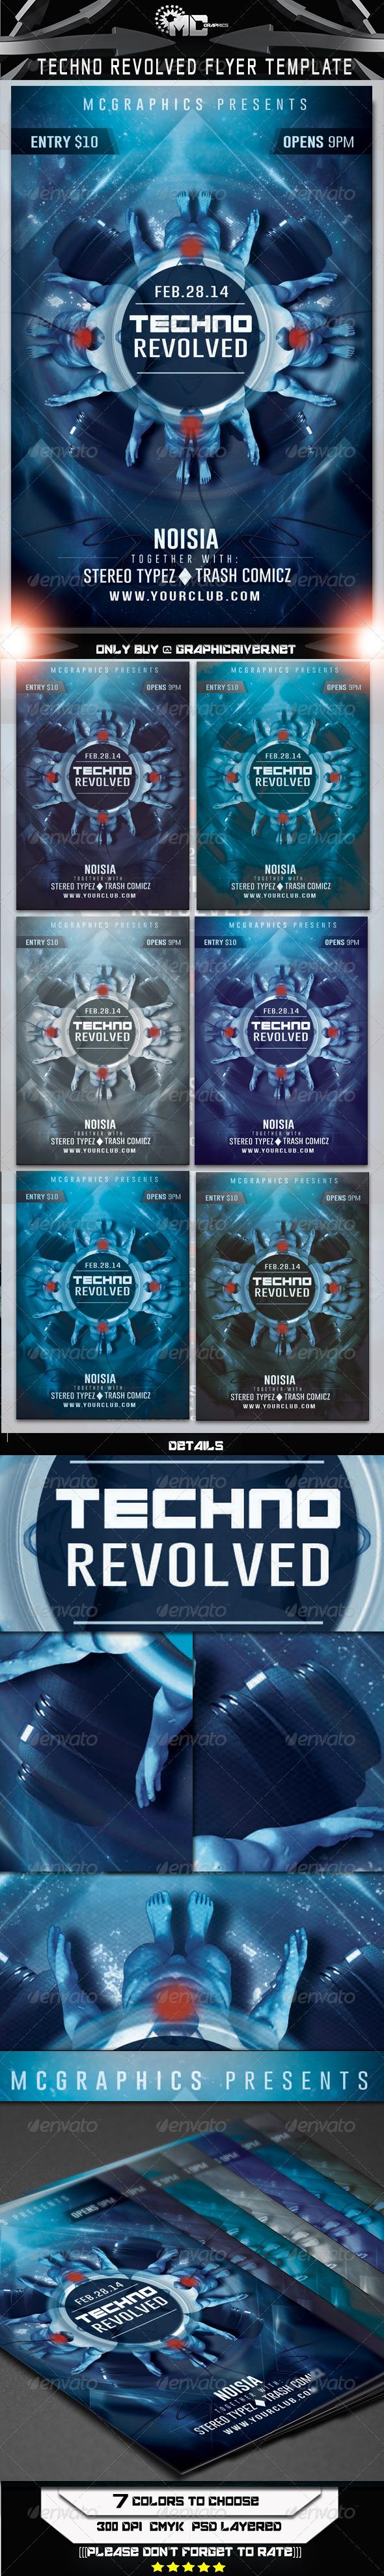 GraphicRiver Techno Revolved Flyer Template 6642984